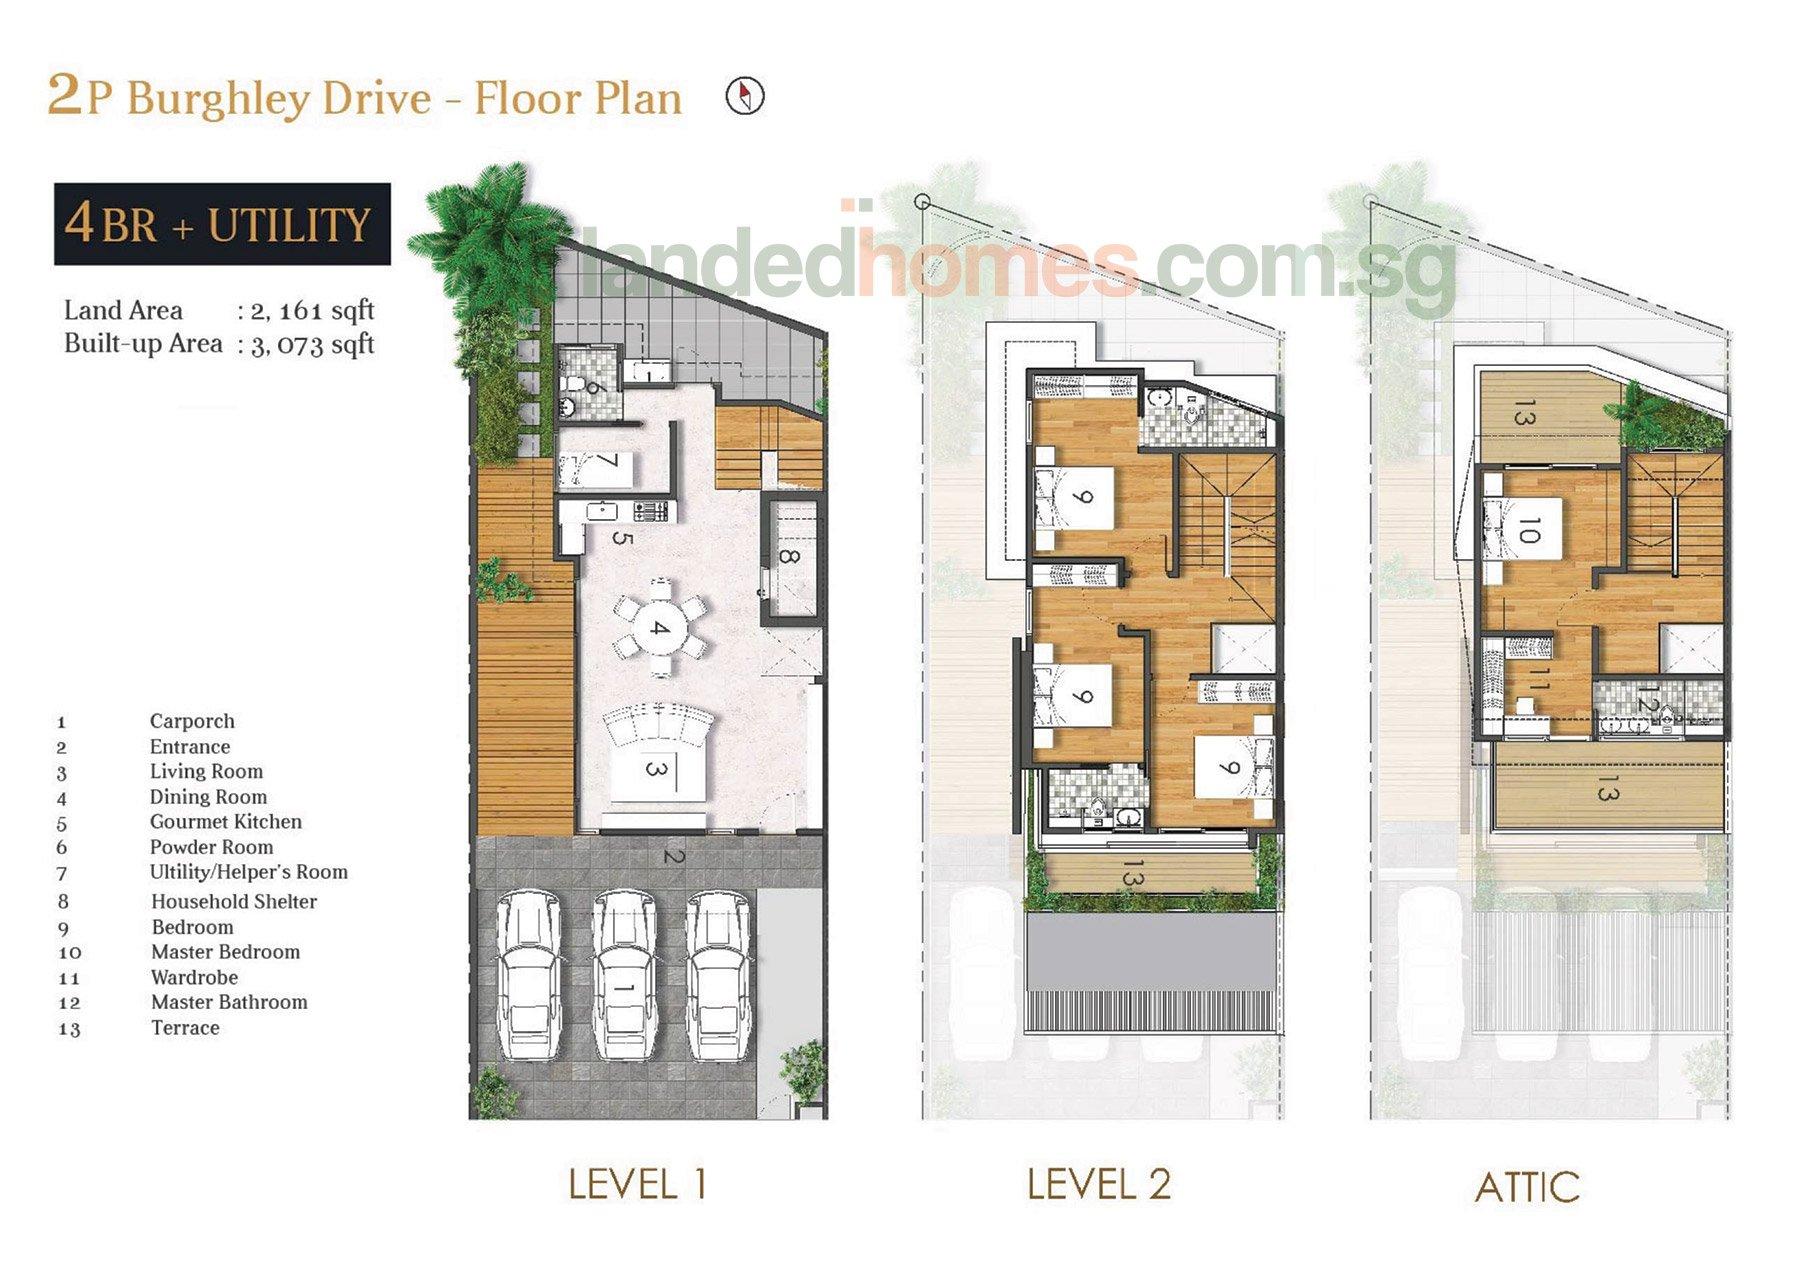 2P Burghley Drive Floor Plan